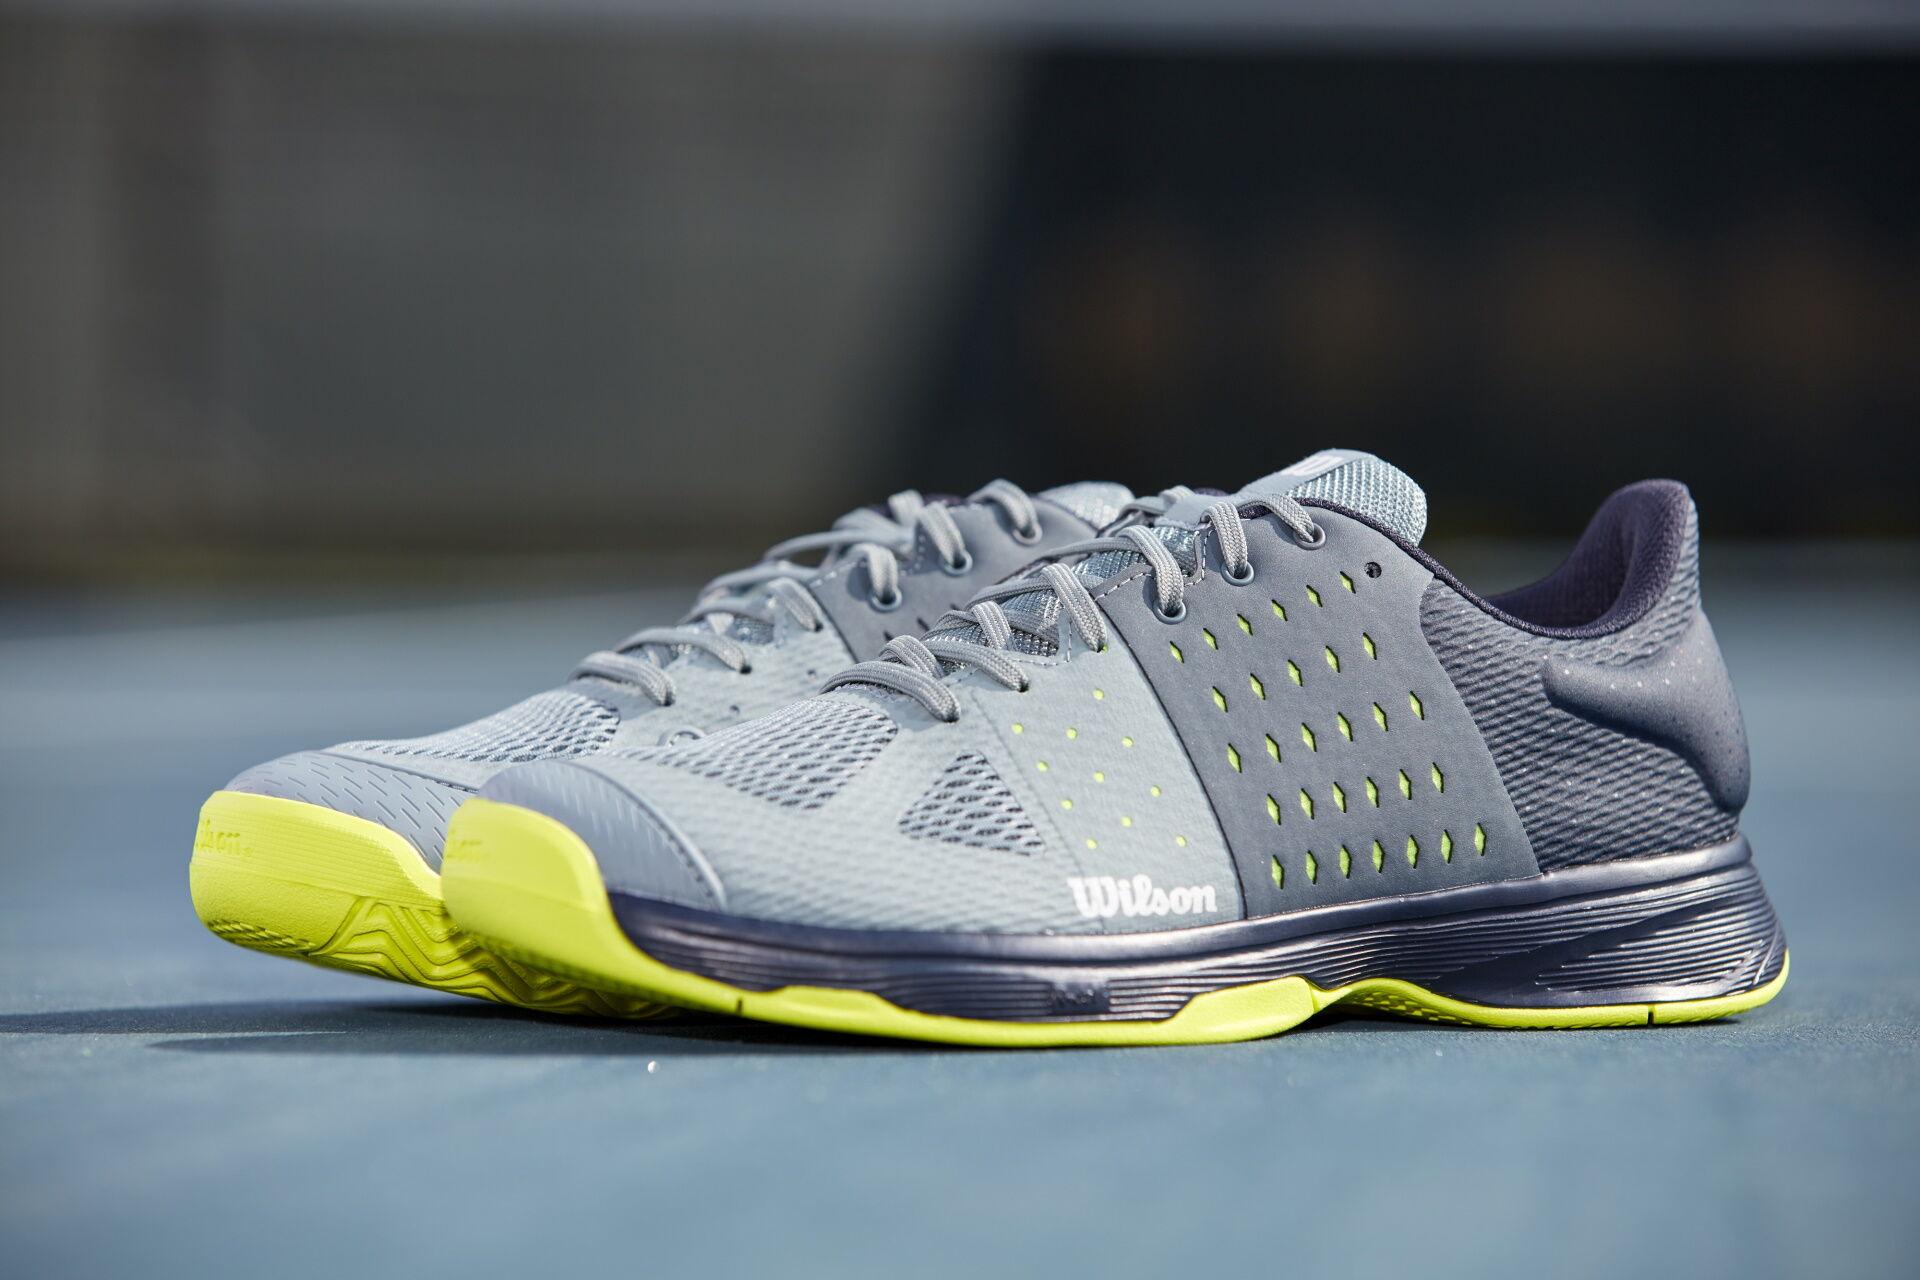 Wilson Kaos Komp teniszcipő